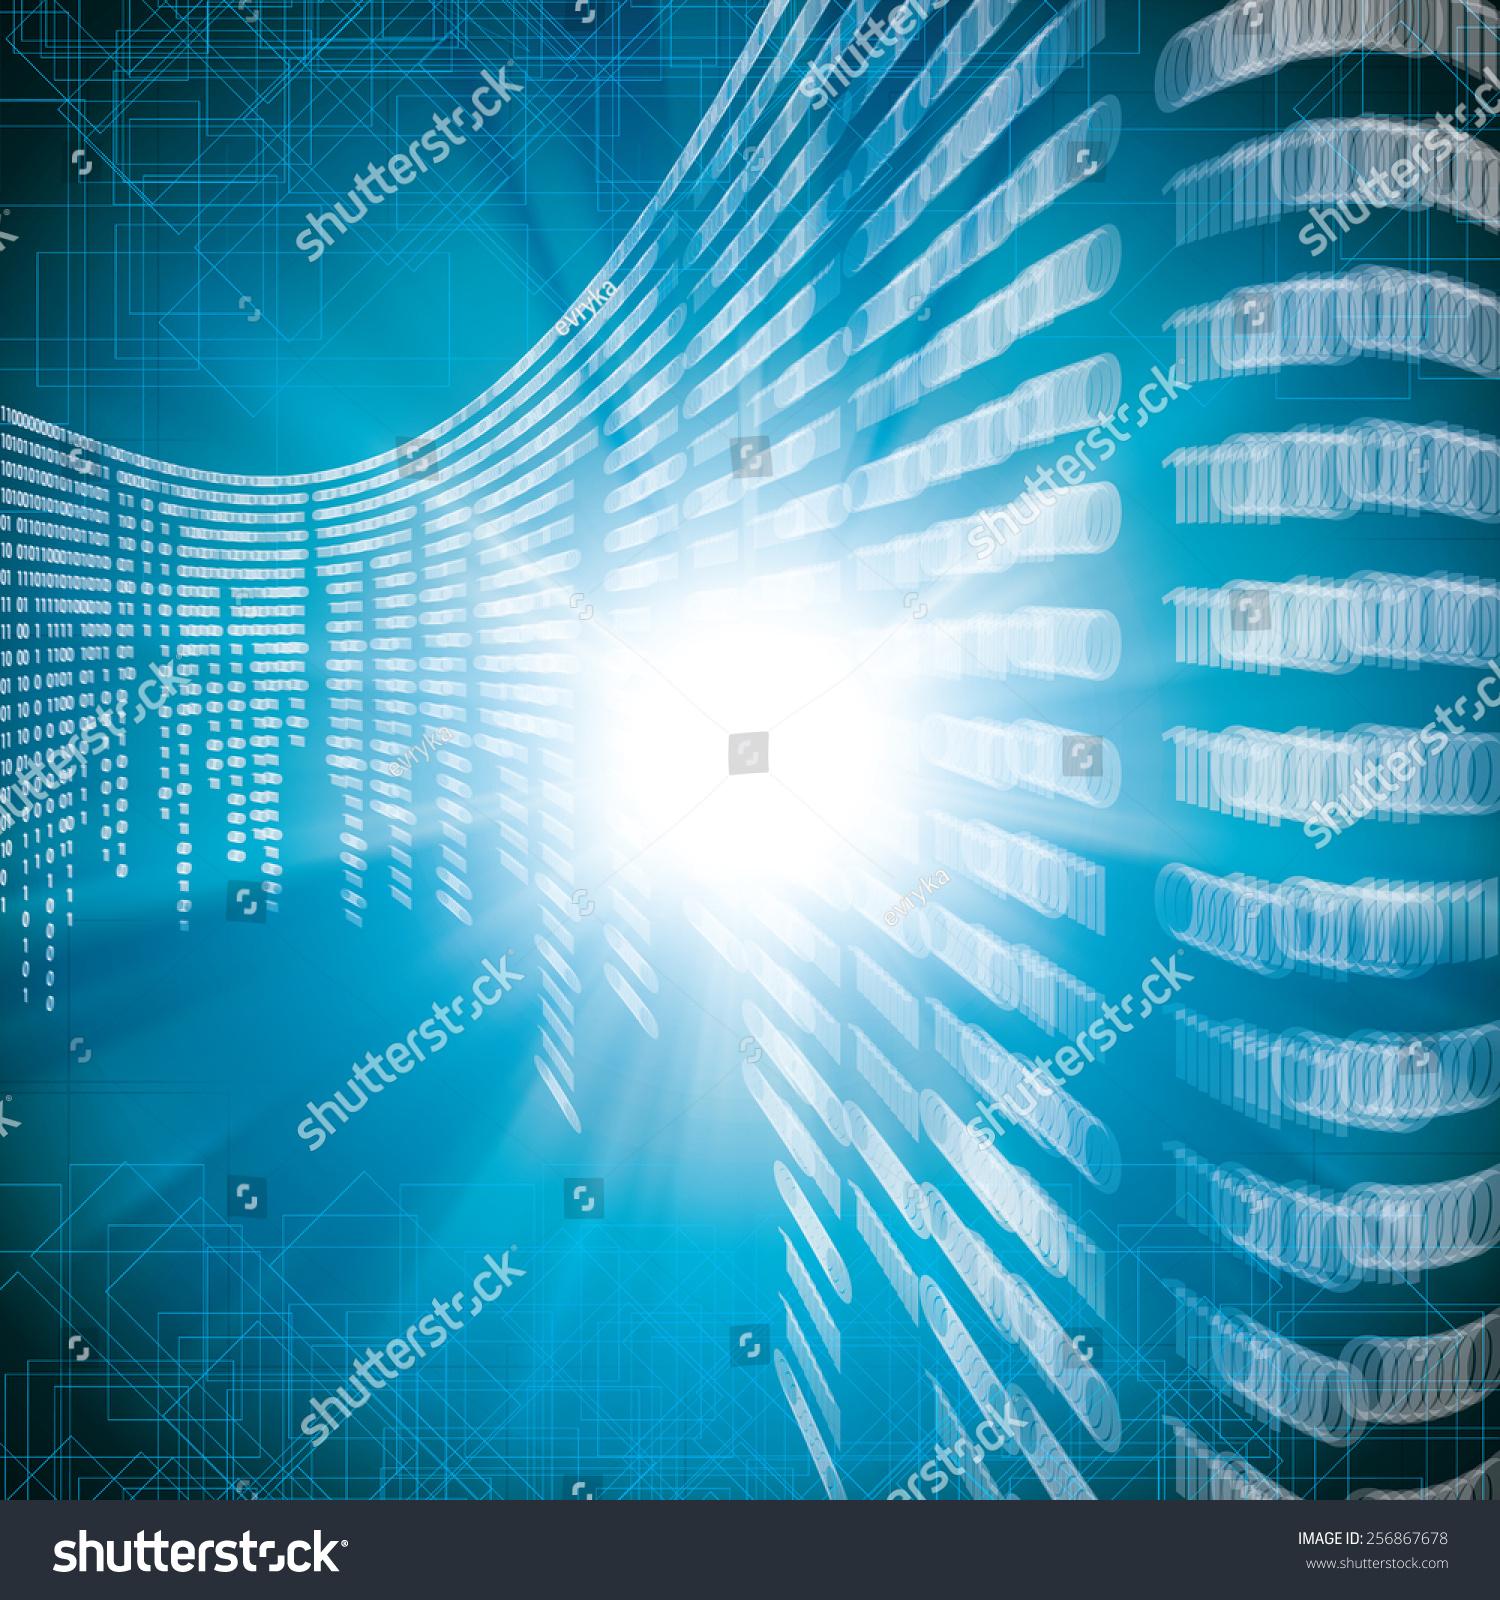 Abstract Tech Blur Blurry Binary Blue Stock Vector 256867678 ...